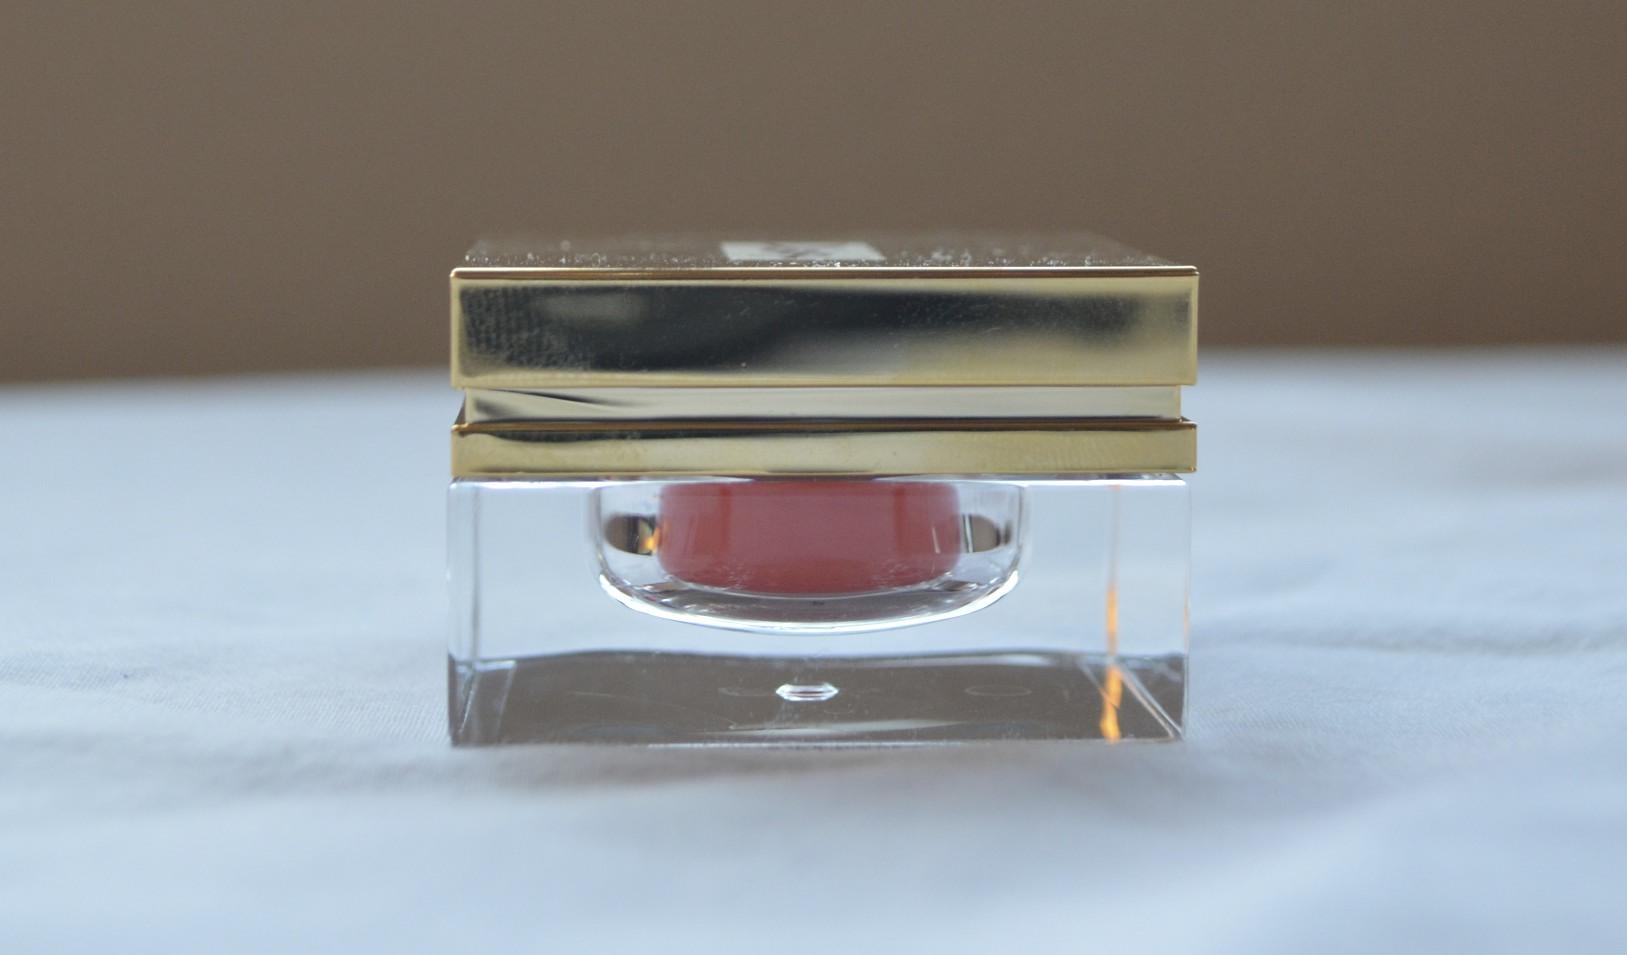 ysl audacious orange blush review